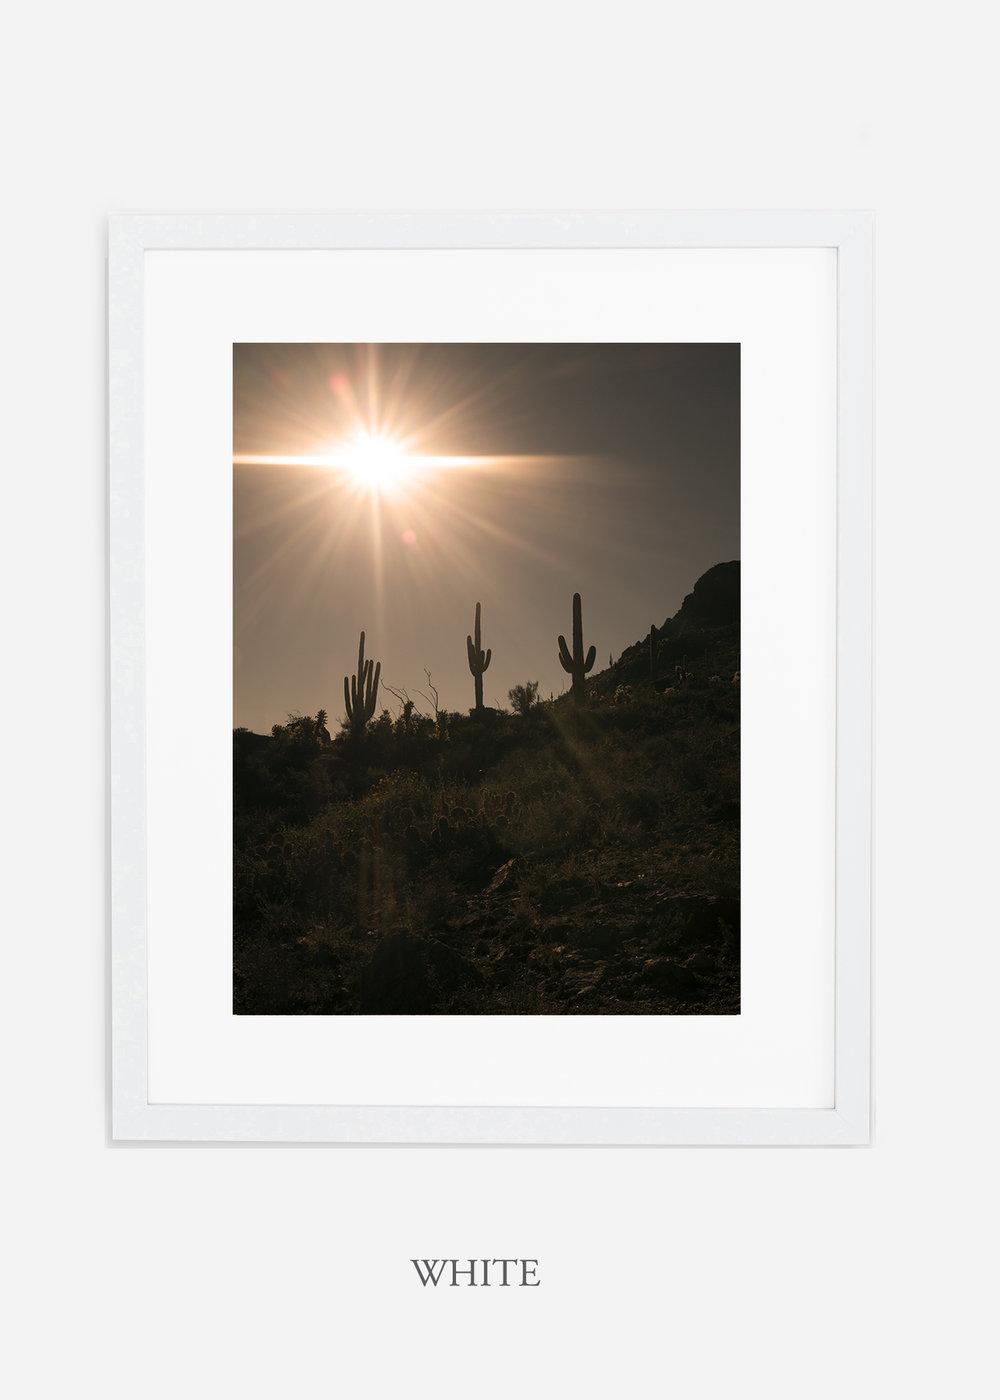 whiteframe-saguaroNo.16-wildercalifornia-art-wallart-cactusprint-homedecor-prints-arizona-botanical-artwork-interiordesign.jpg